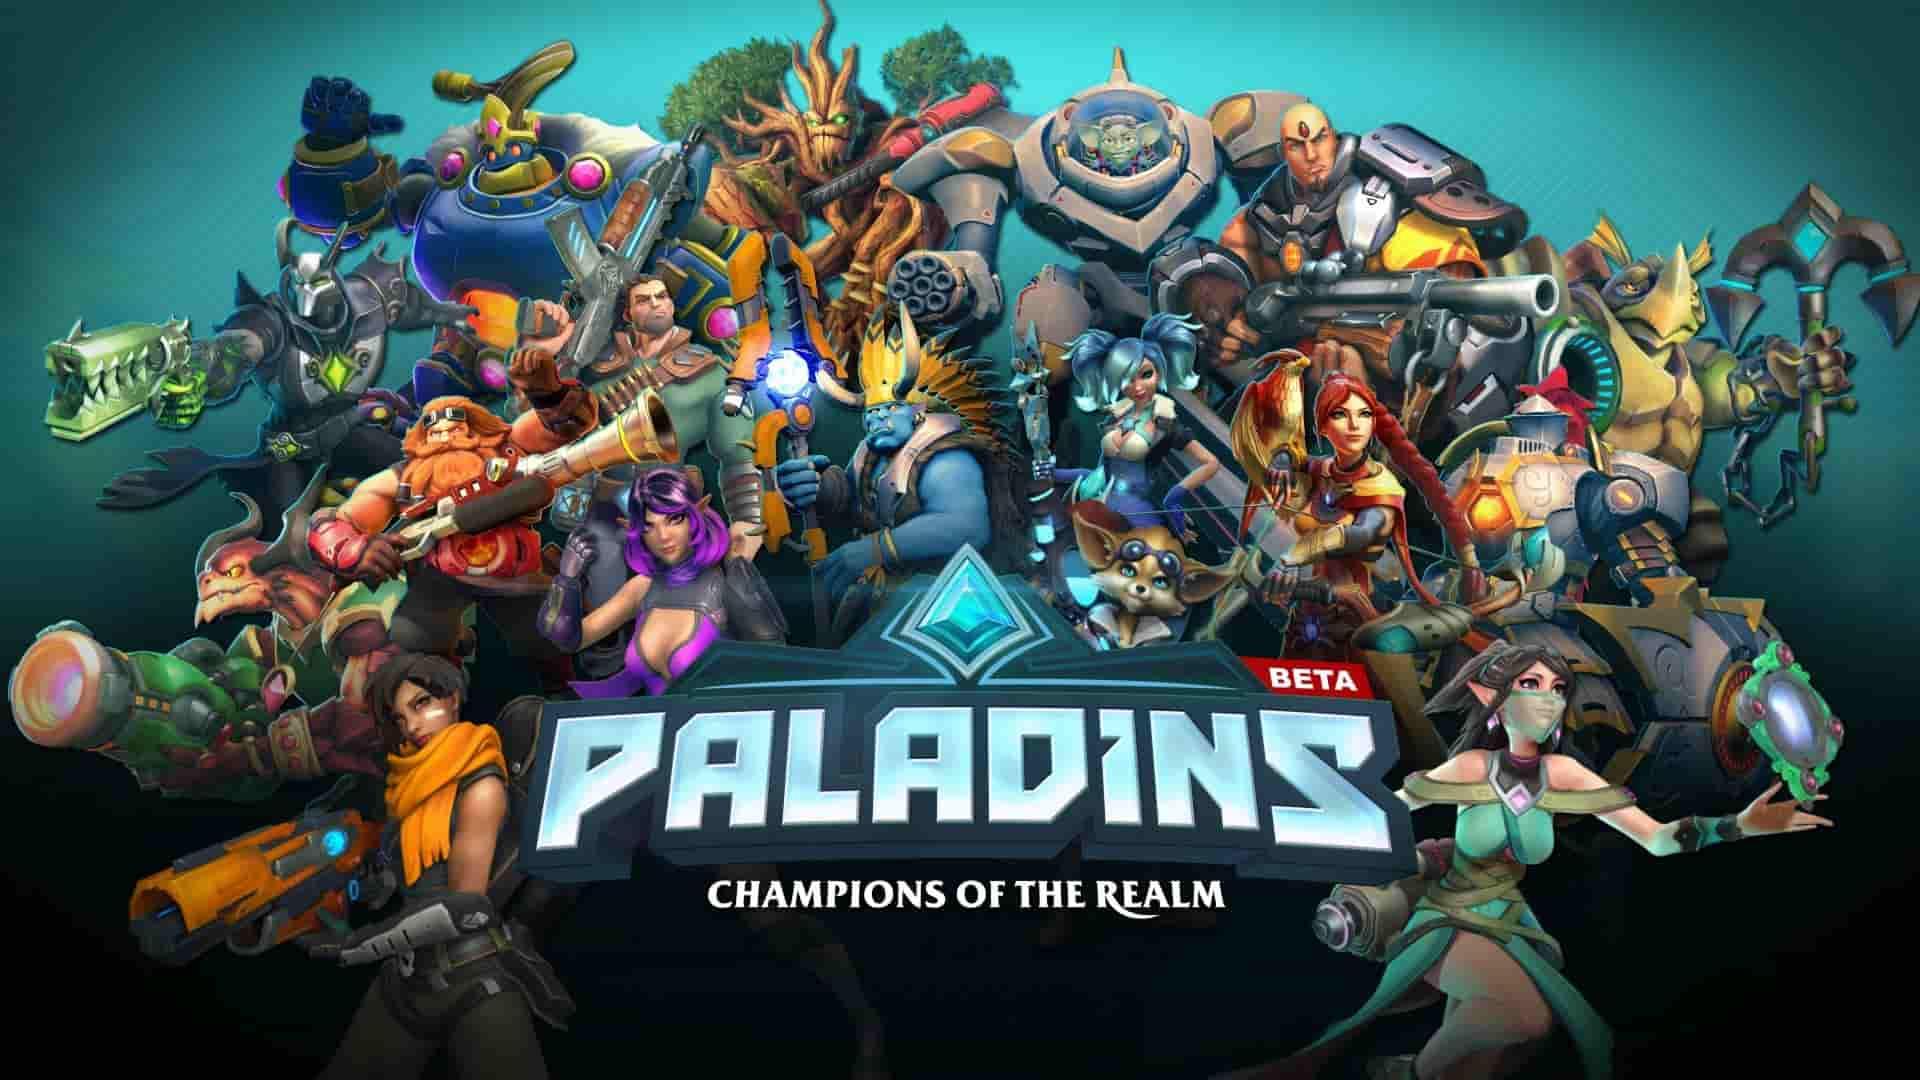 Paladins Update 2.23 August 12